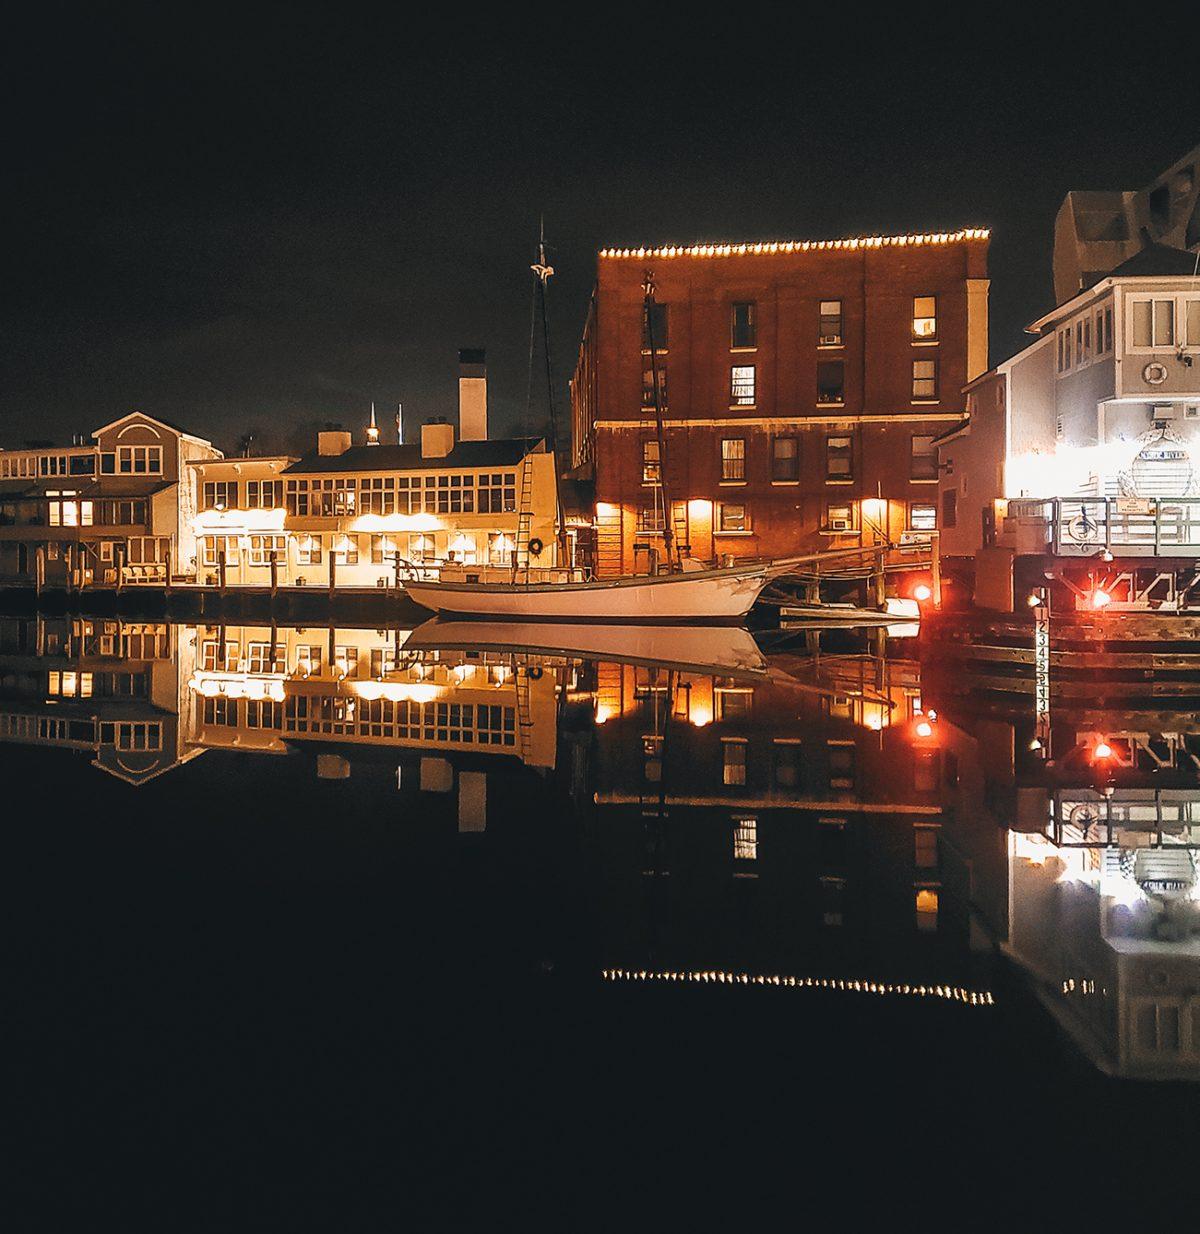 steamboat inn night